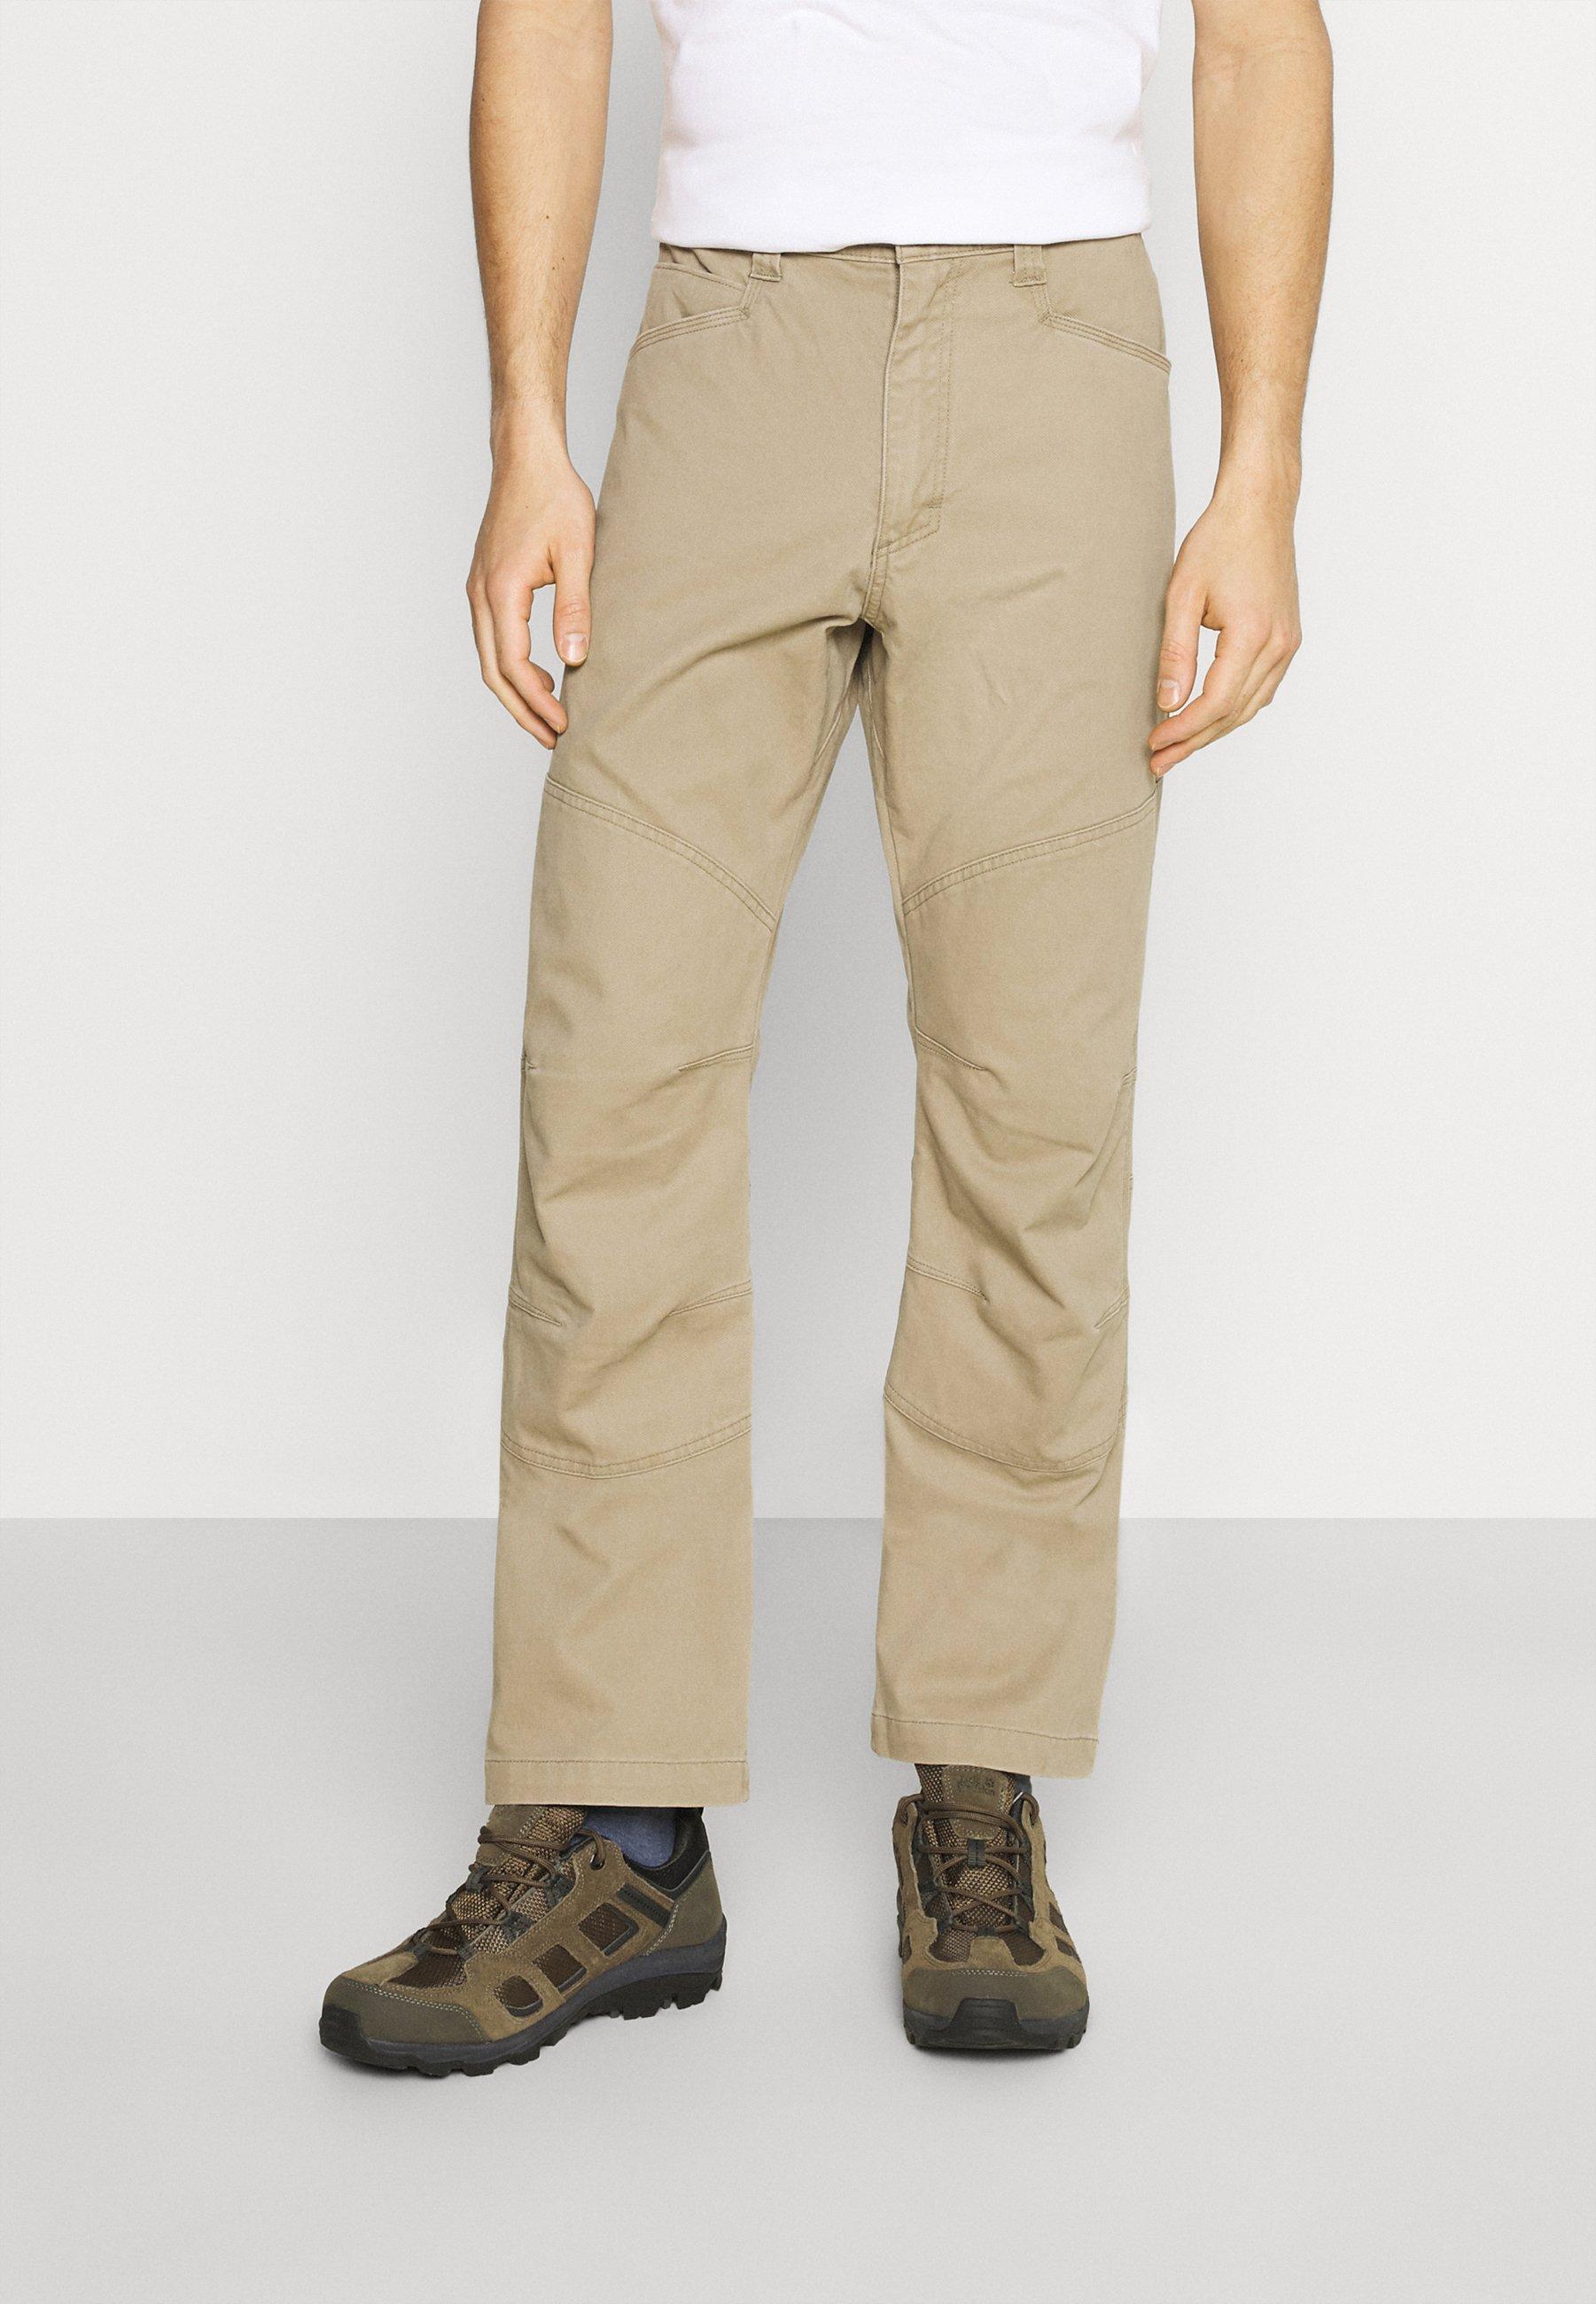 Uomo ALL TERRAIN GEAR REINFORCED UTILITY PANT - Pantaloni